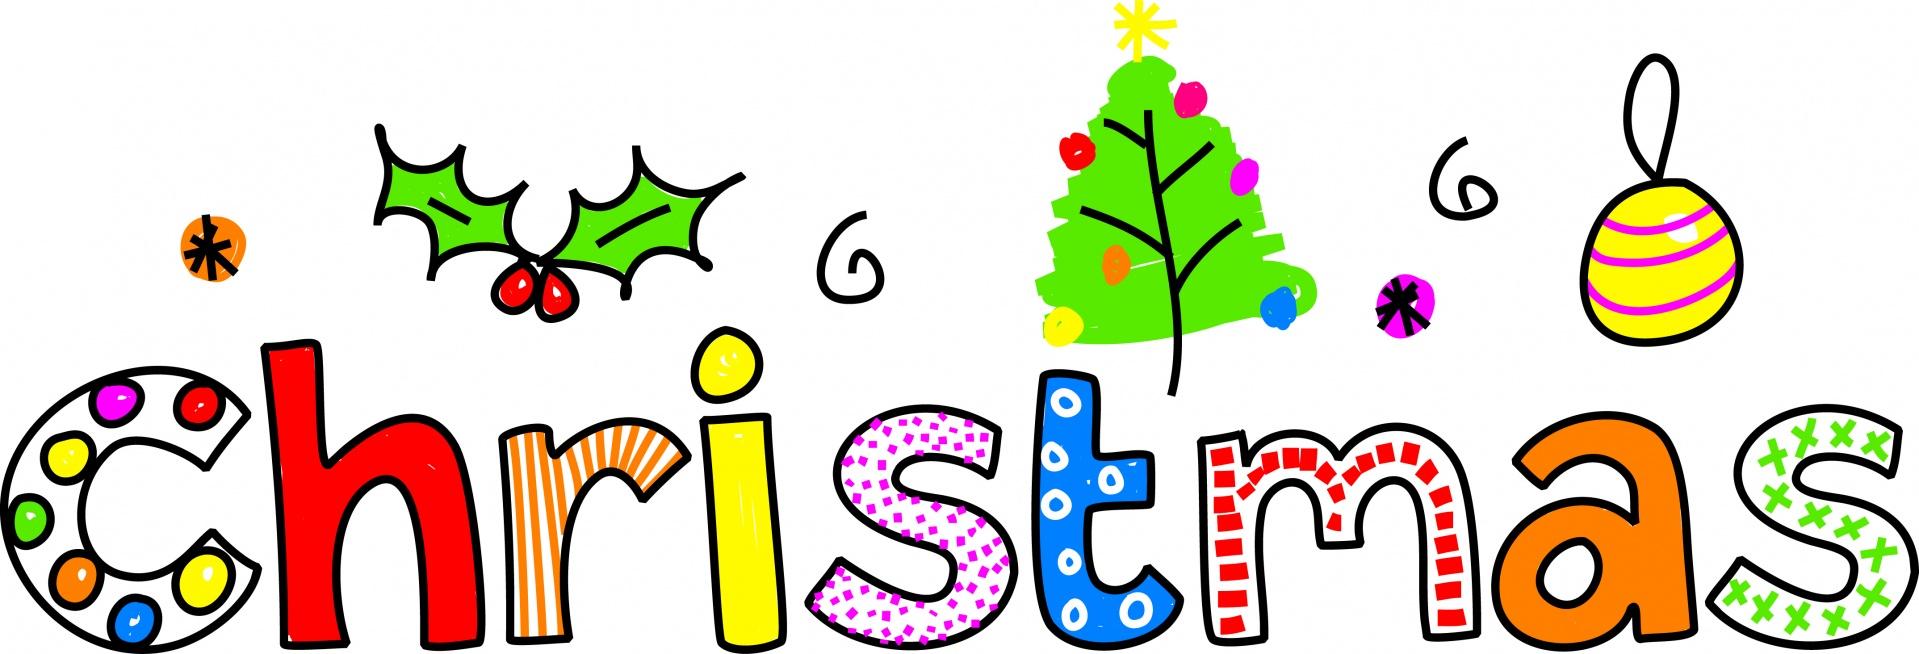 1919x654 Merry Christmas Banner Clipart